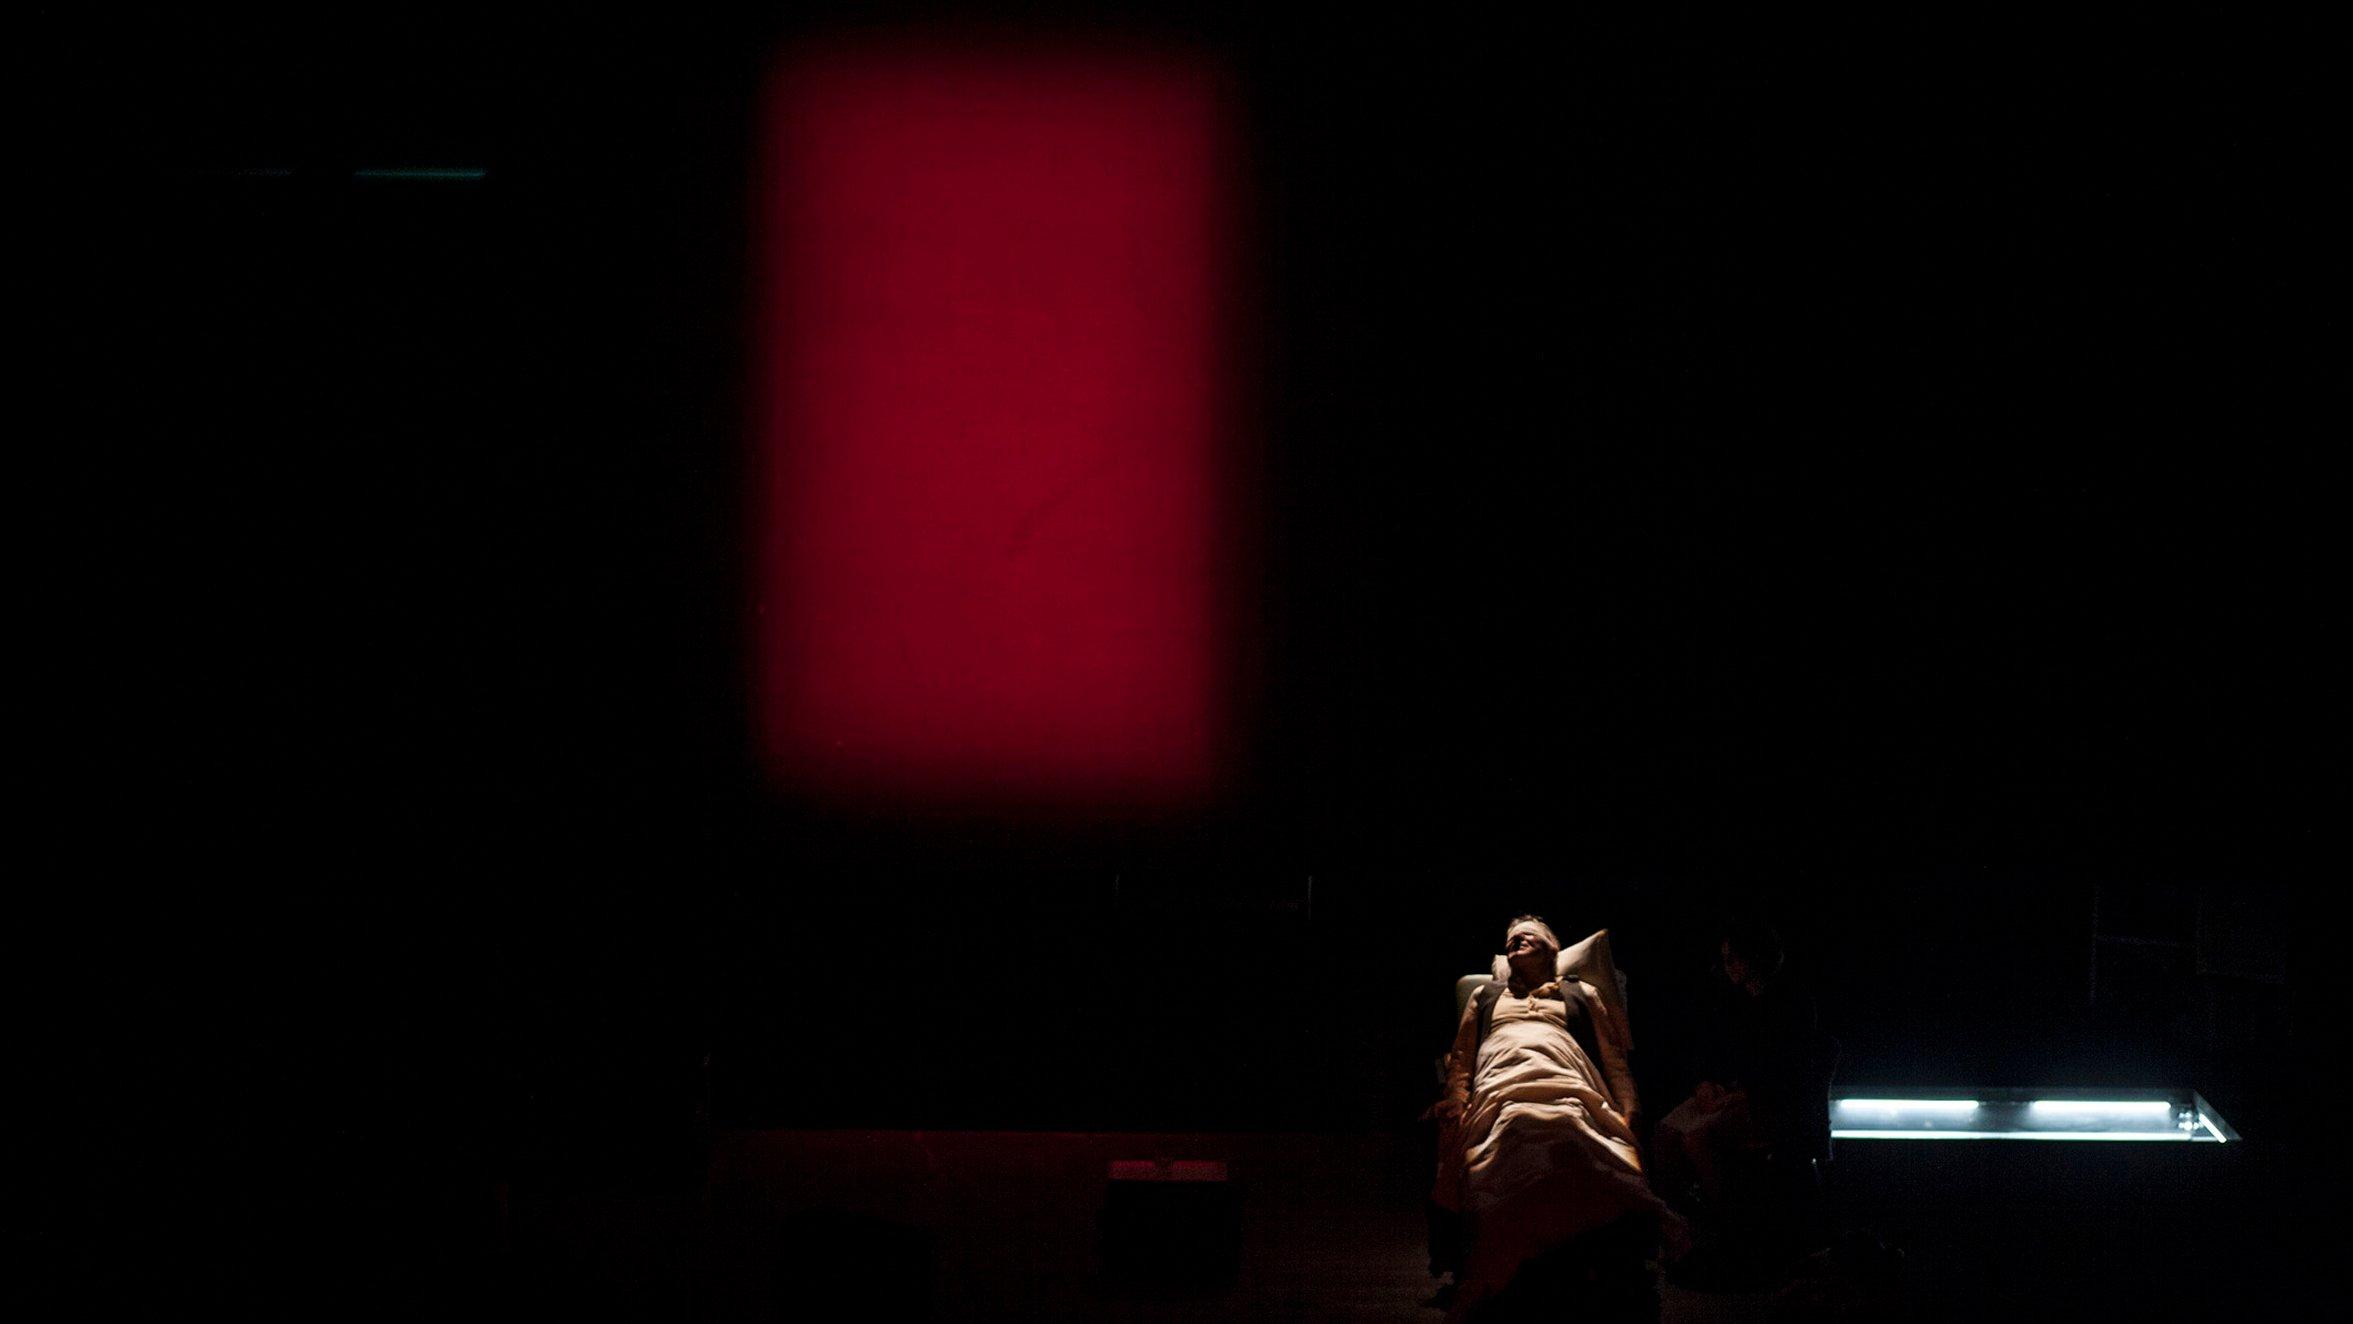 Serata a Colono, regia Mario Martone, 2013 ©Mario Spada